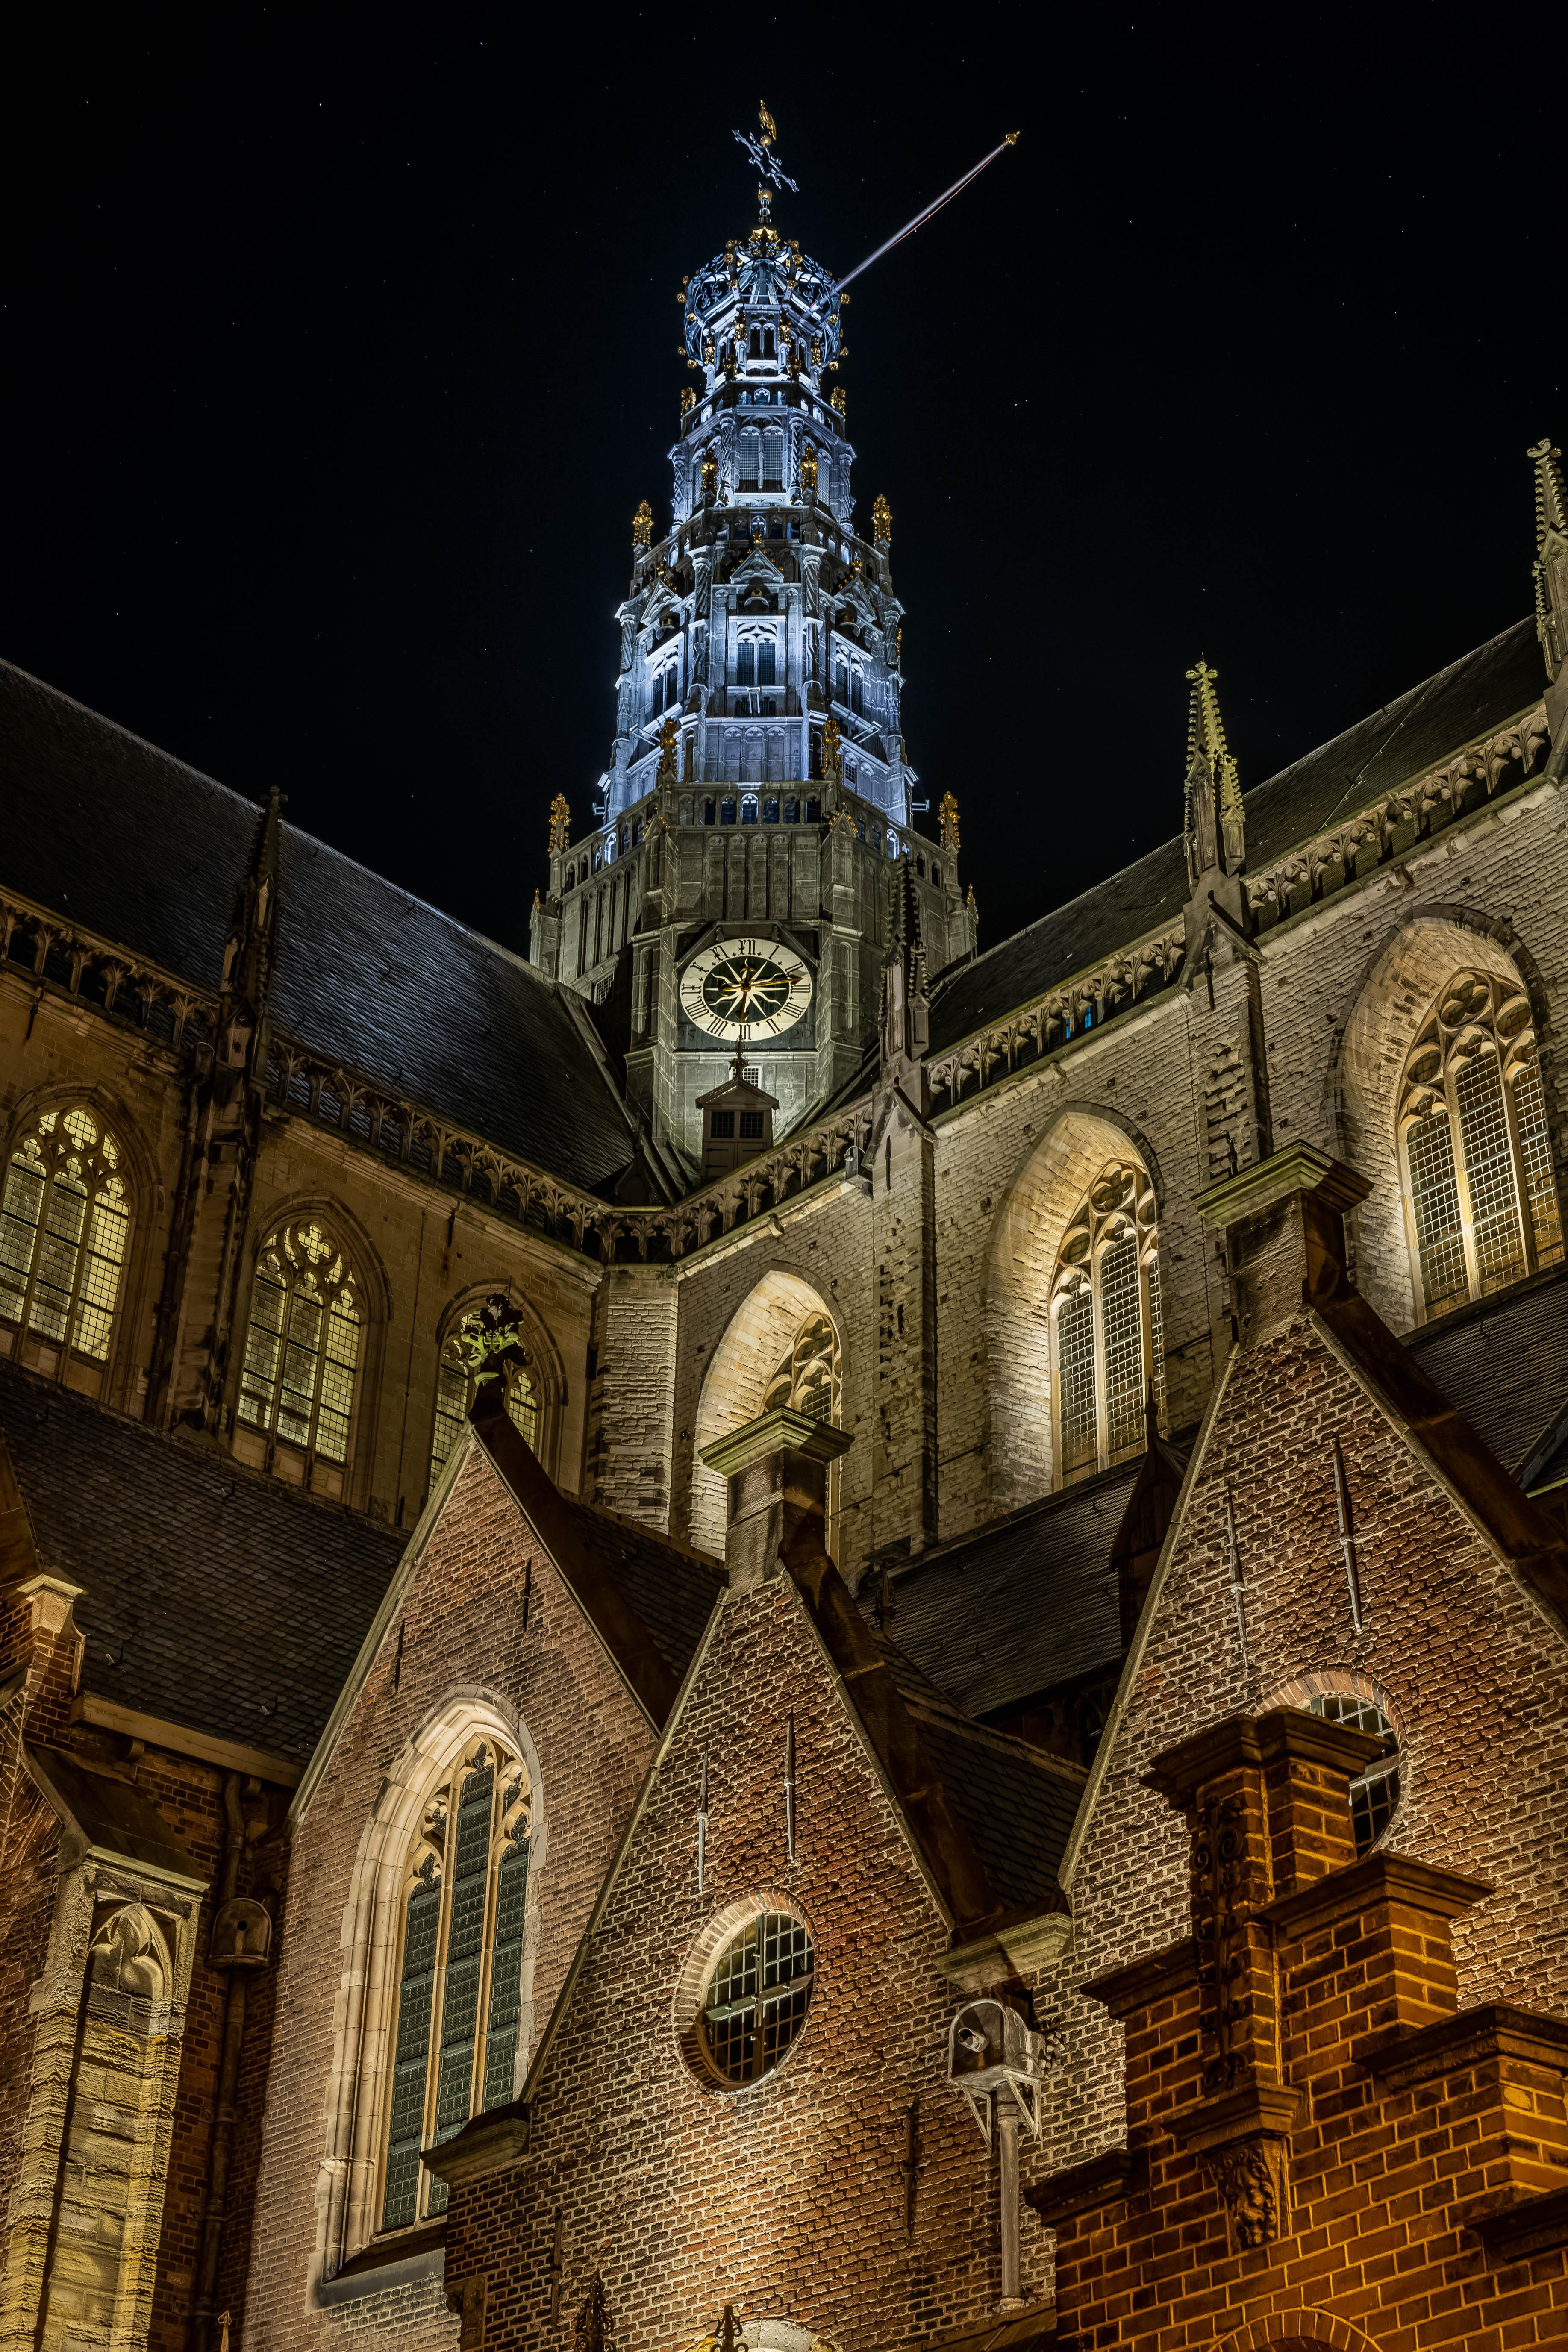 Lezersfoto: Verlichte kerk in donkere dagen